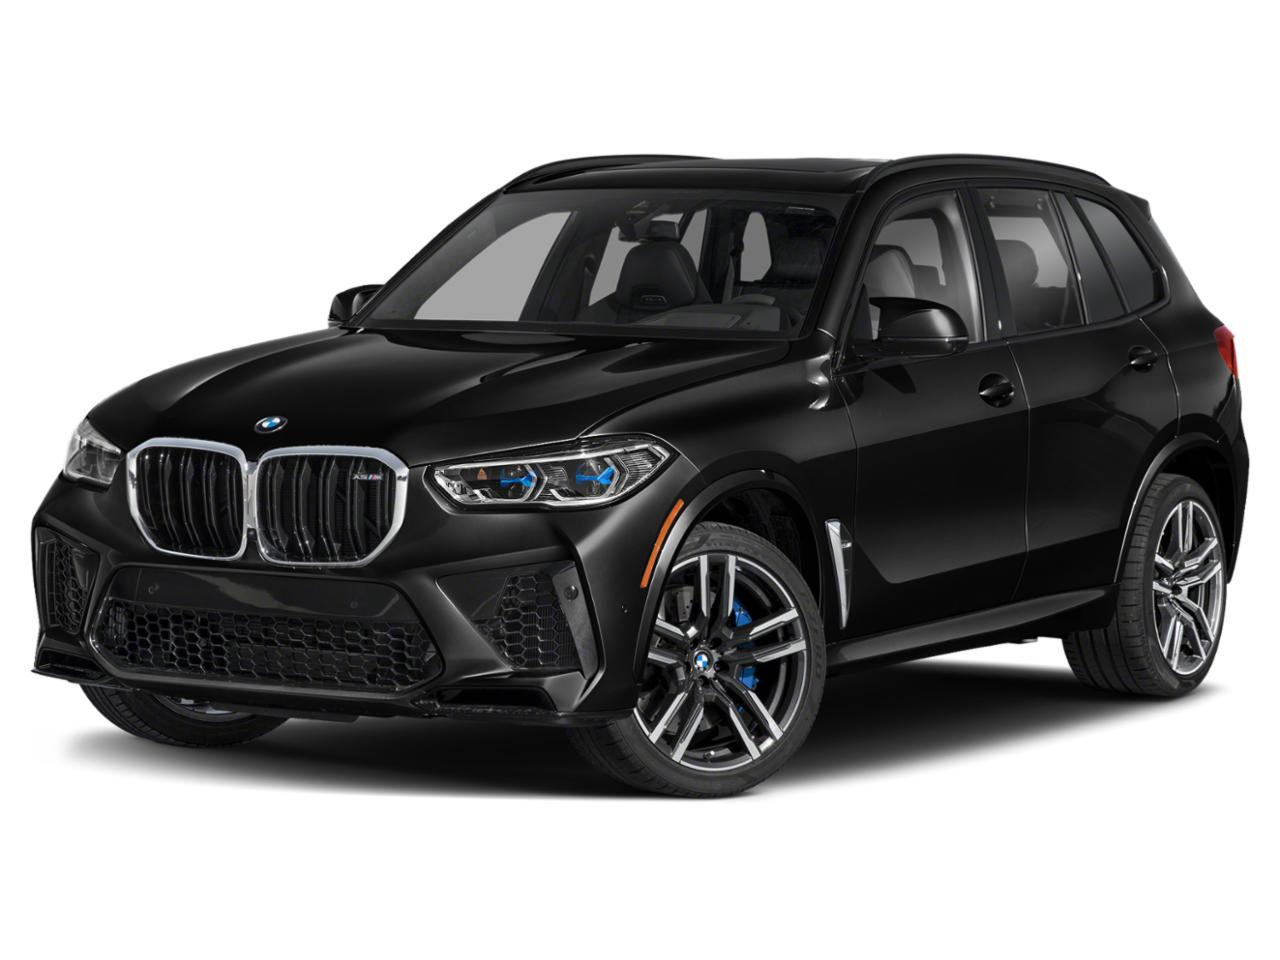 2021 BMW X5 M Vehicle Photo in Plainfield, IL 60586